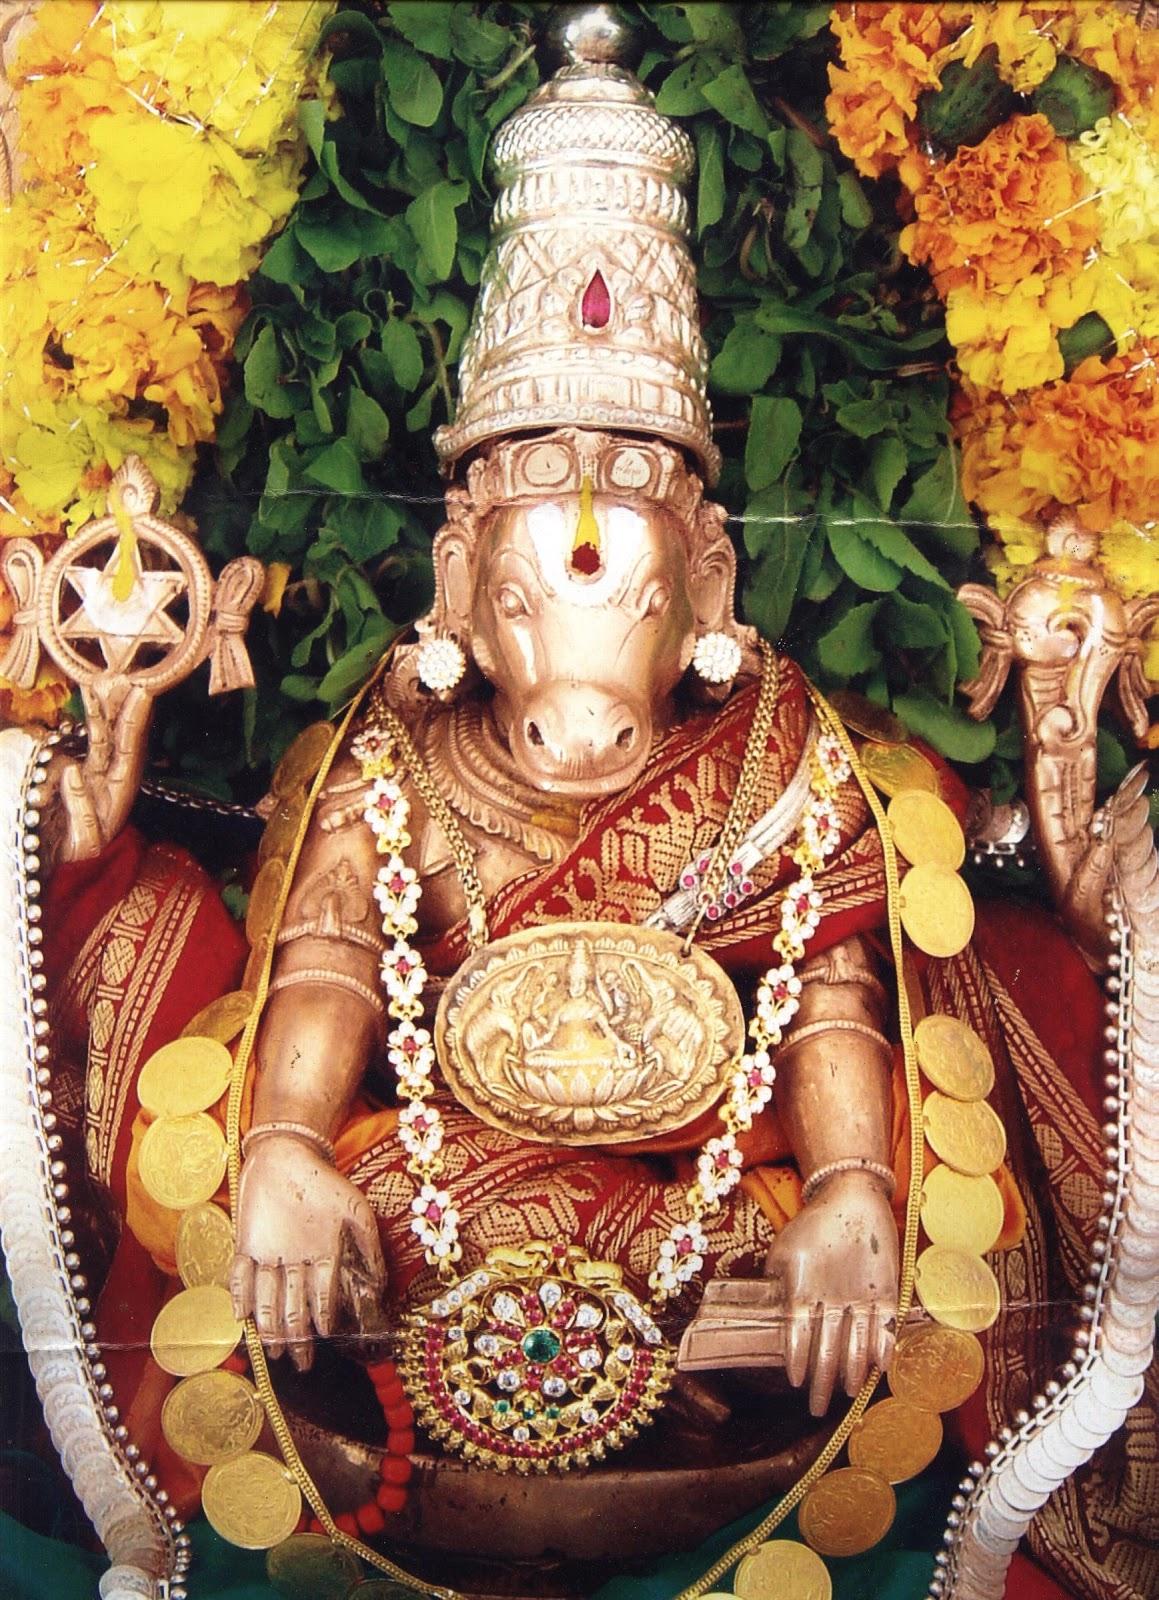 http://4.bp.blogspot.com/-zU6s1EMtkEg/TgGBOh6ePcI/AAAAAAAAELg/KlLZ7NjfIhQ/s1600/hindu-lord-hayagriva-picture.jpg